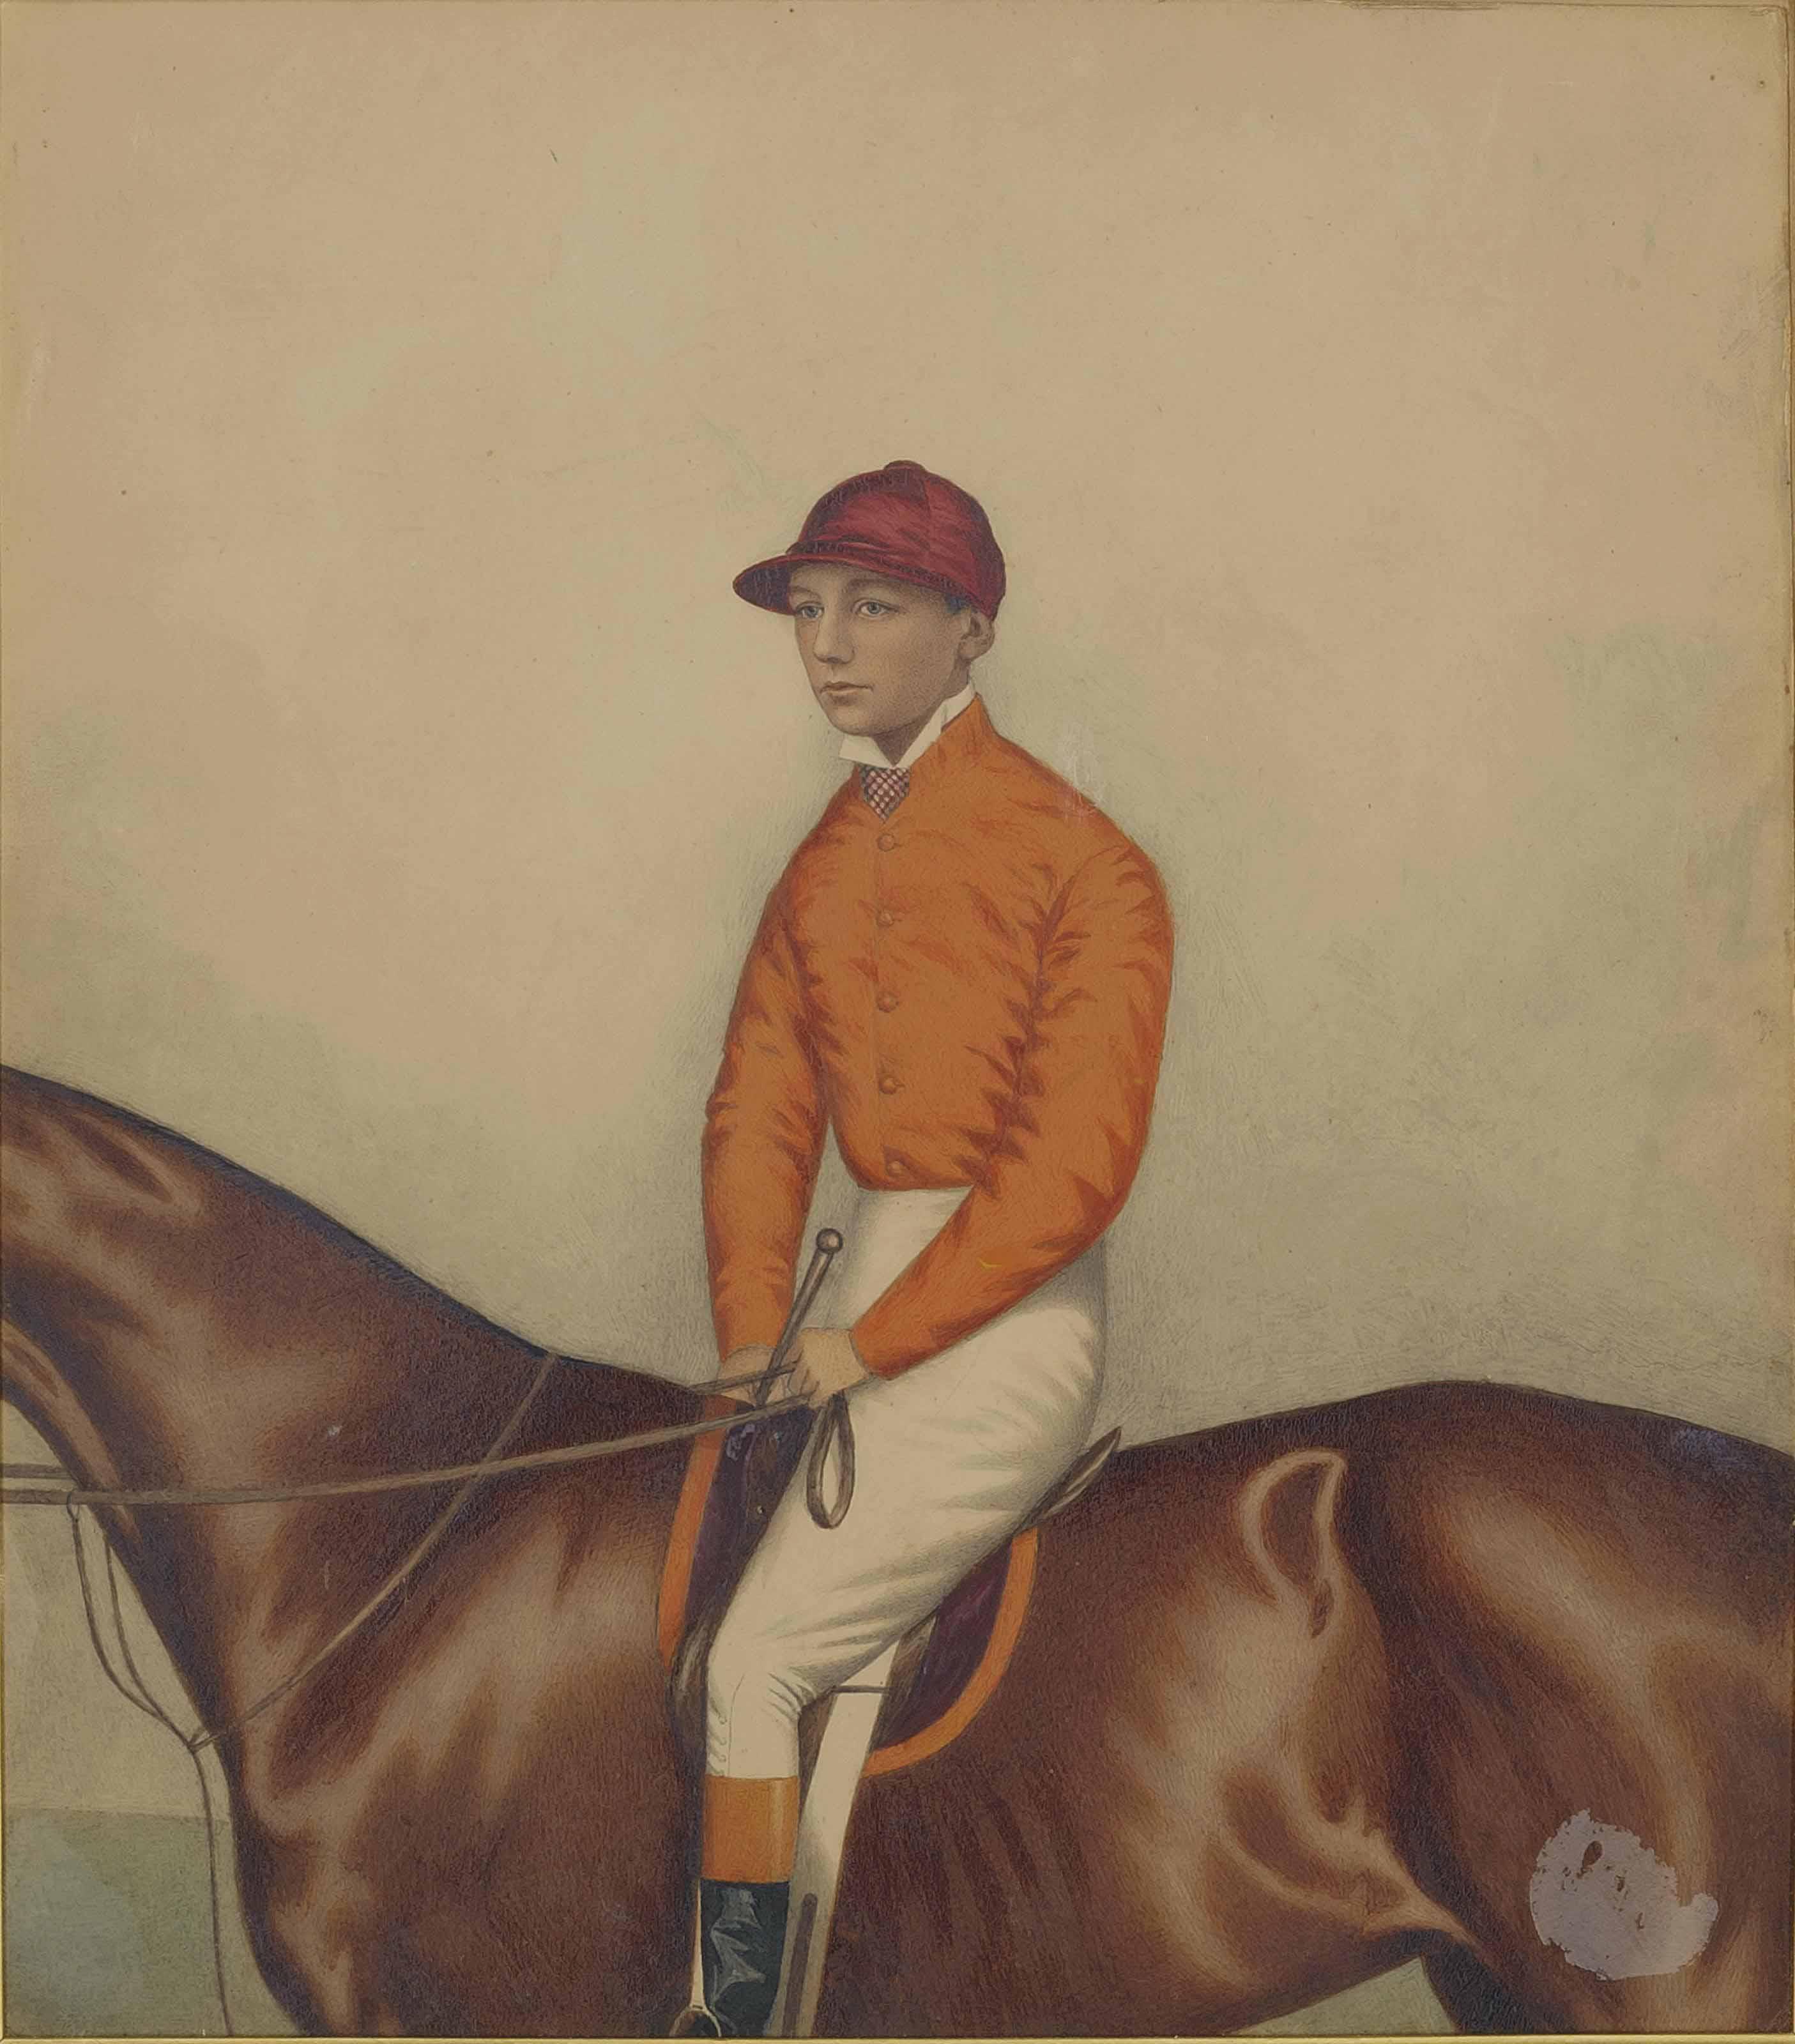 N. Robinson on horseback; and The jockey Finlay on a bay racehorse